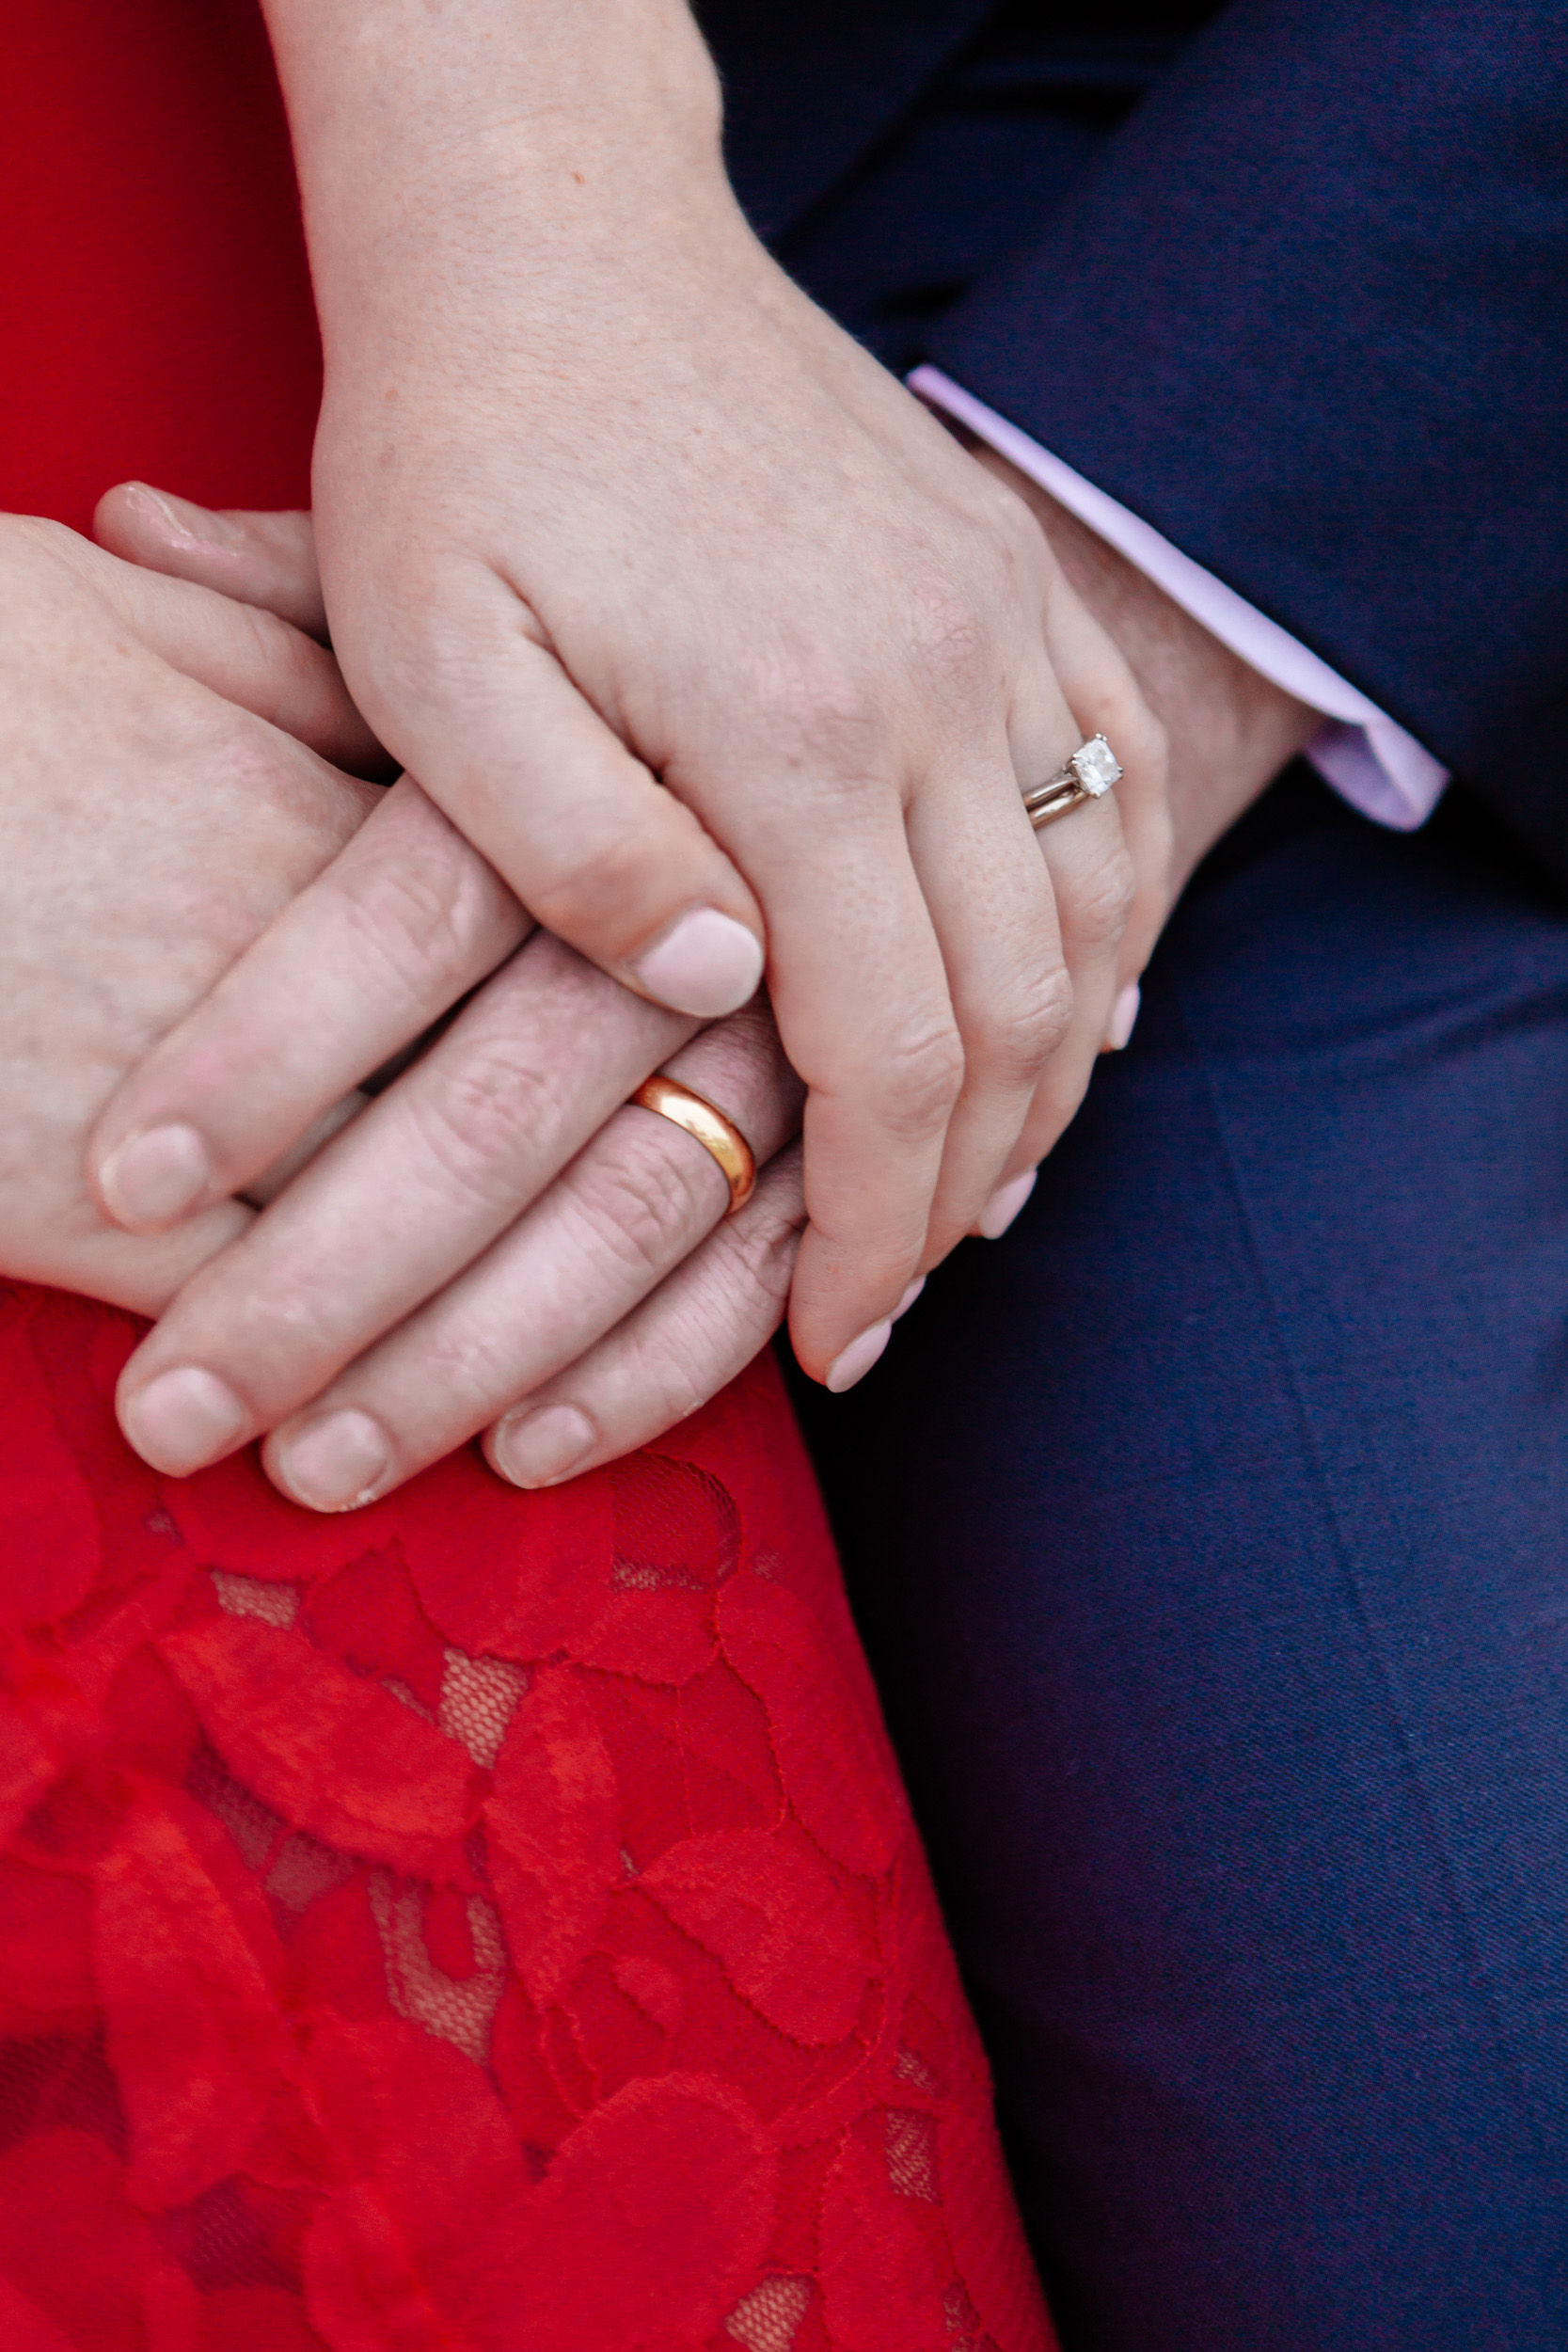 Details of a couple holding hands captured by Paris Photographer Federico Guendel www.iheartparis.fr